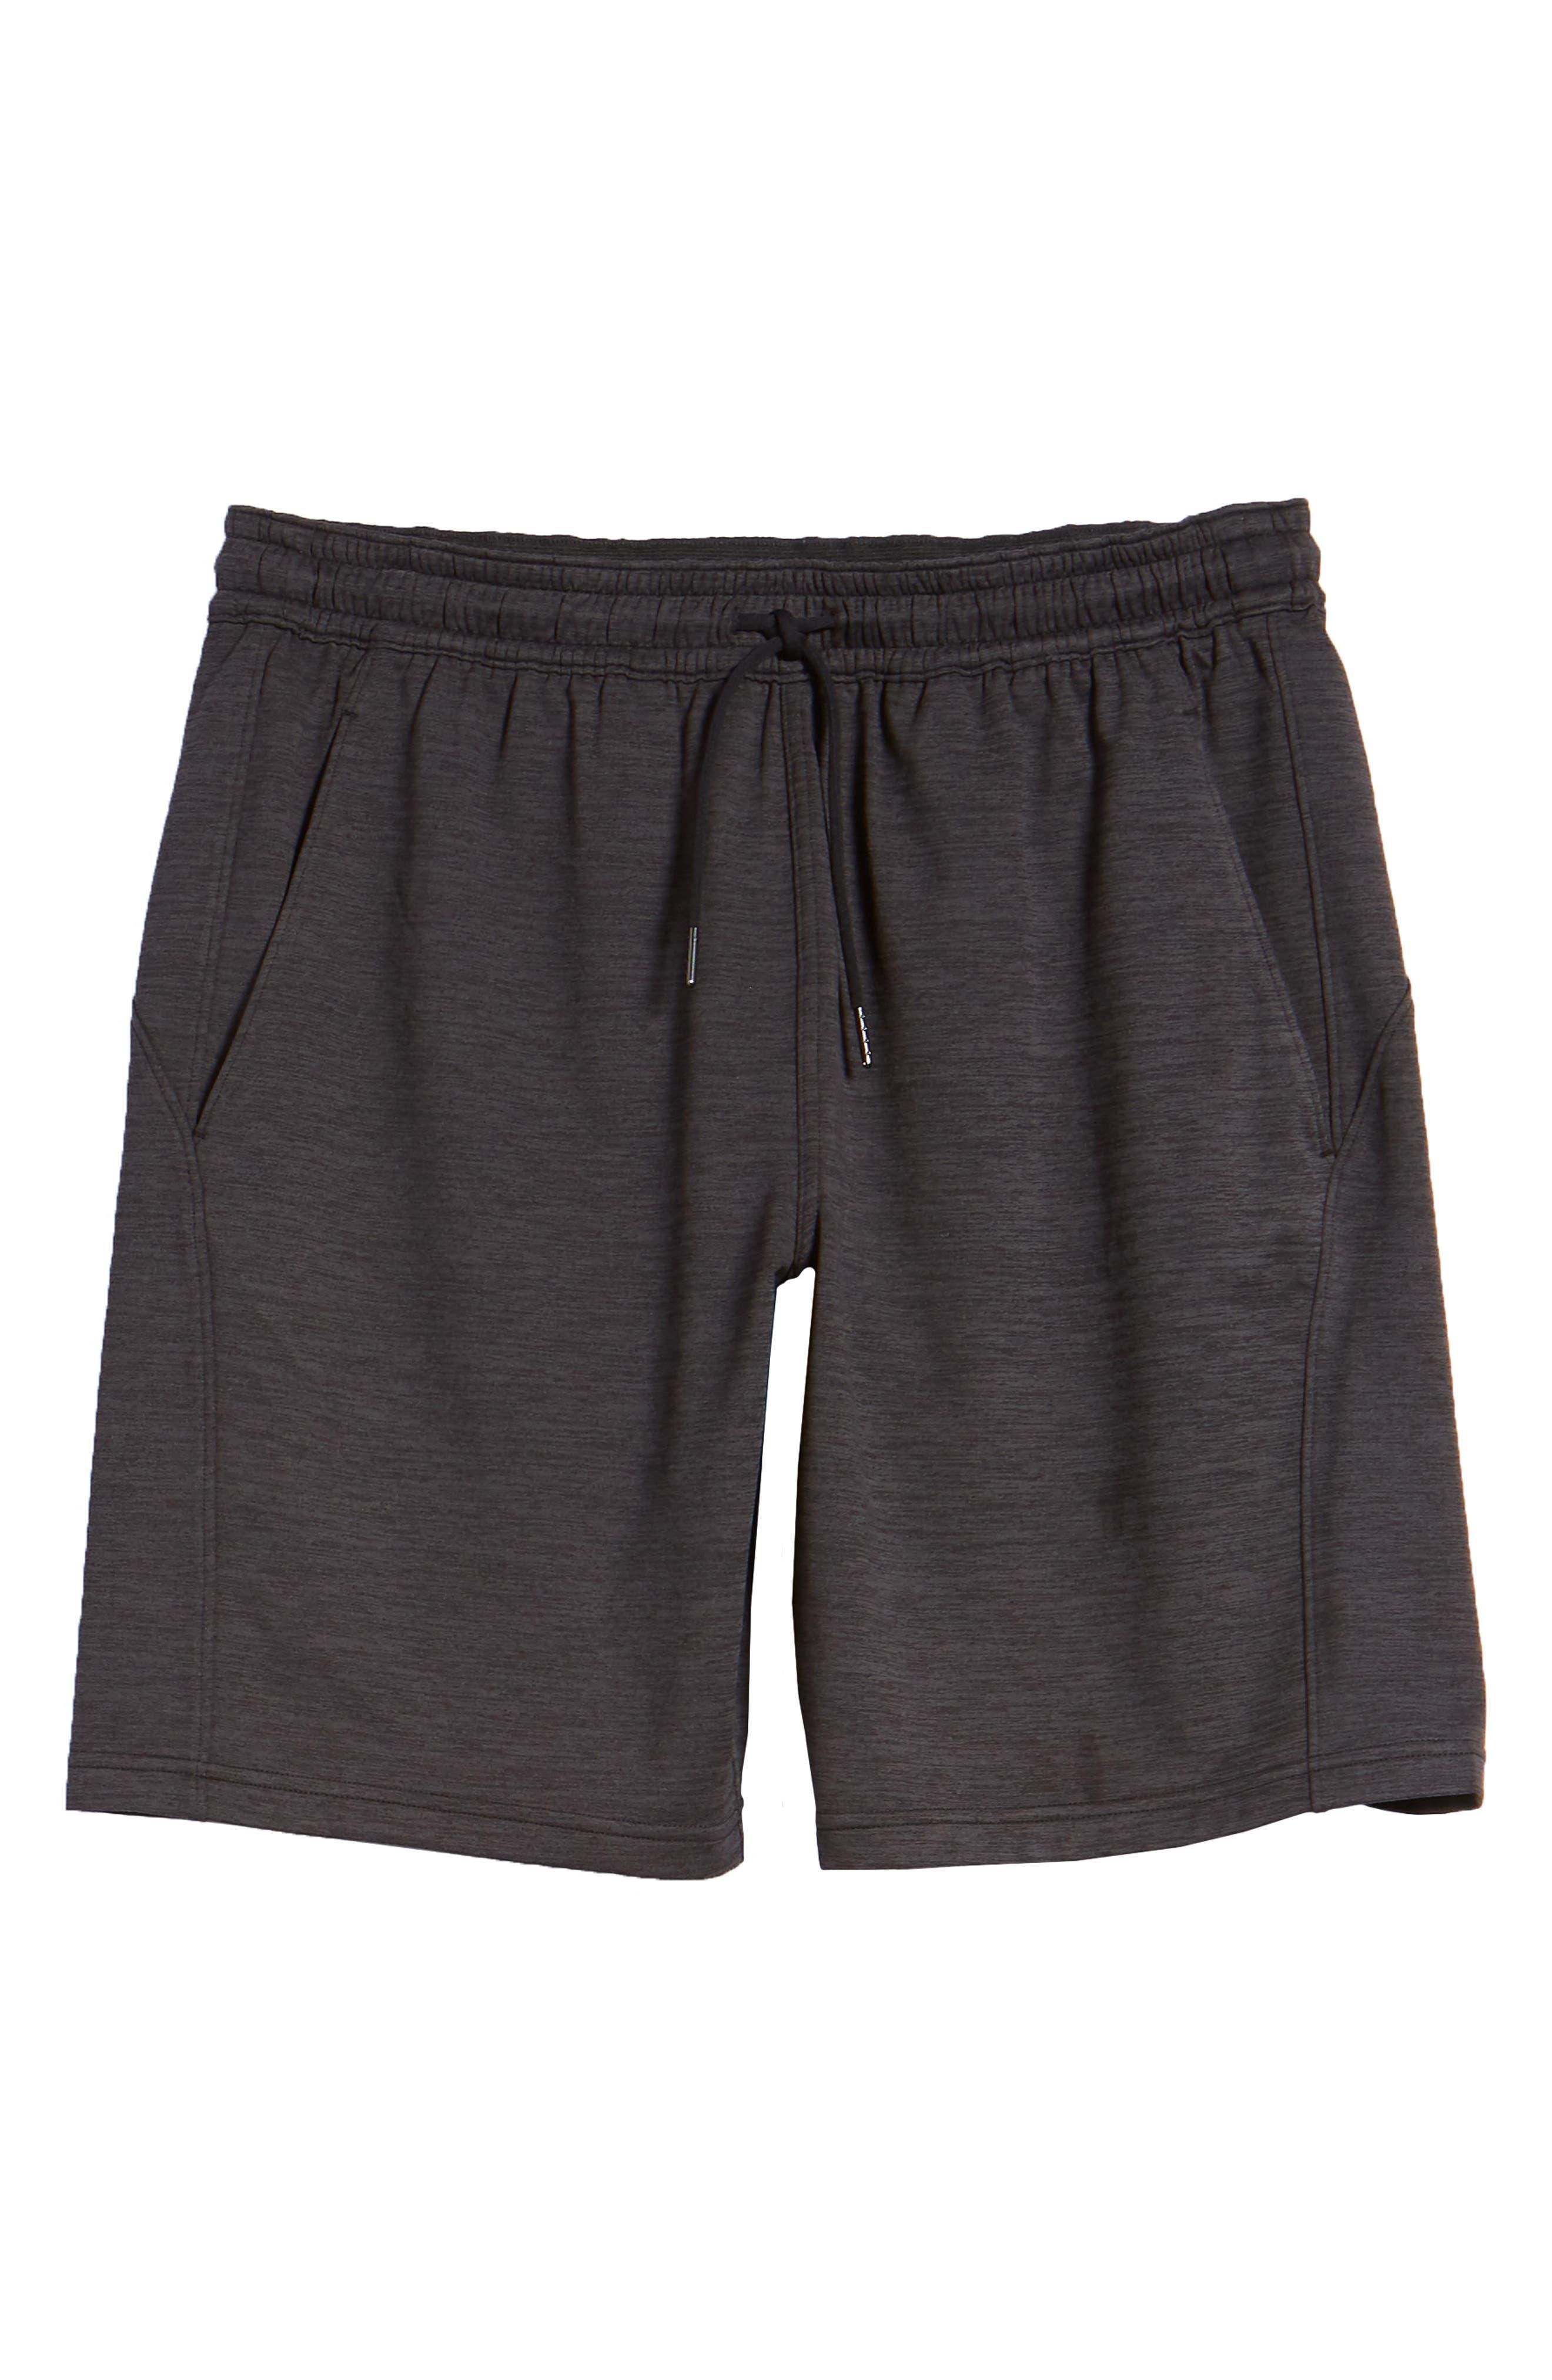 ZELLA,                             Pyrite Knit Shorts,                             Alternate thumbnail 6, color,                             BLACK OXIDE MELANGE